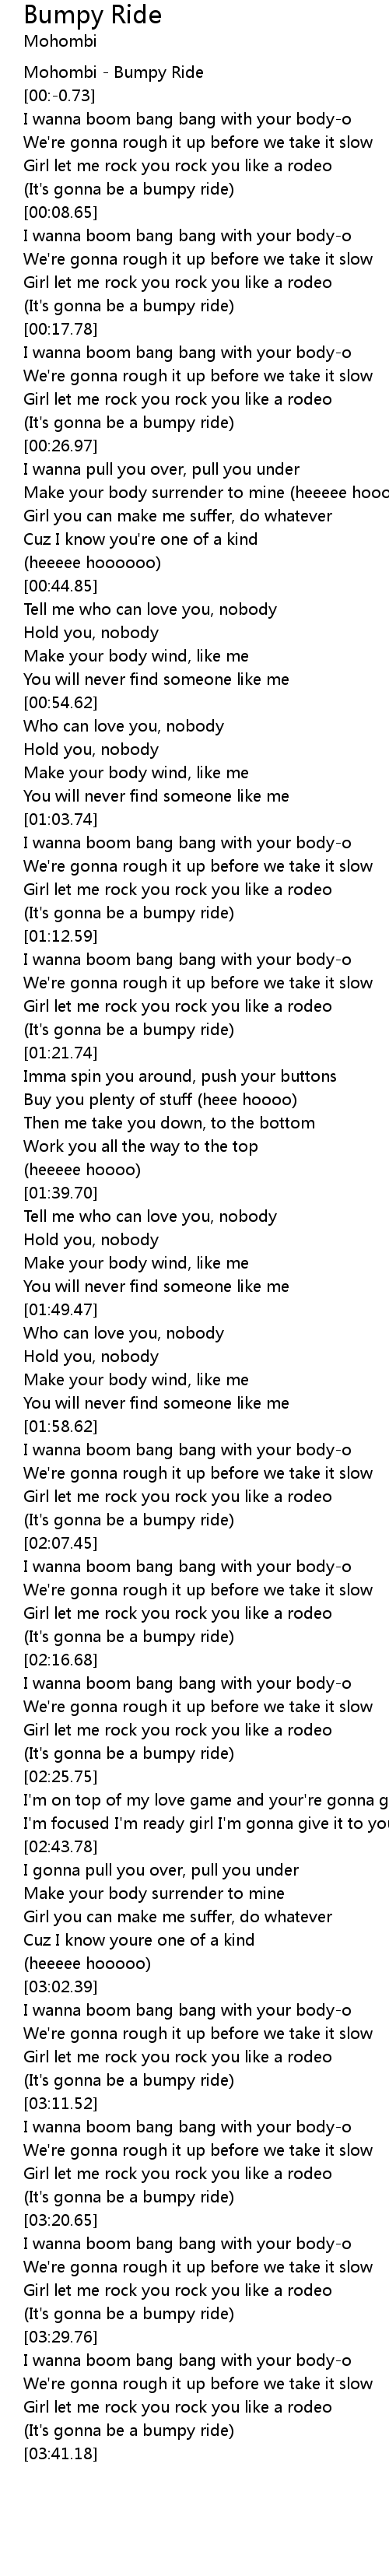 Bumpy Ride Lyrics Follow Lyrics Know what this song is about? bumpy ride lyrics follow lyrics